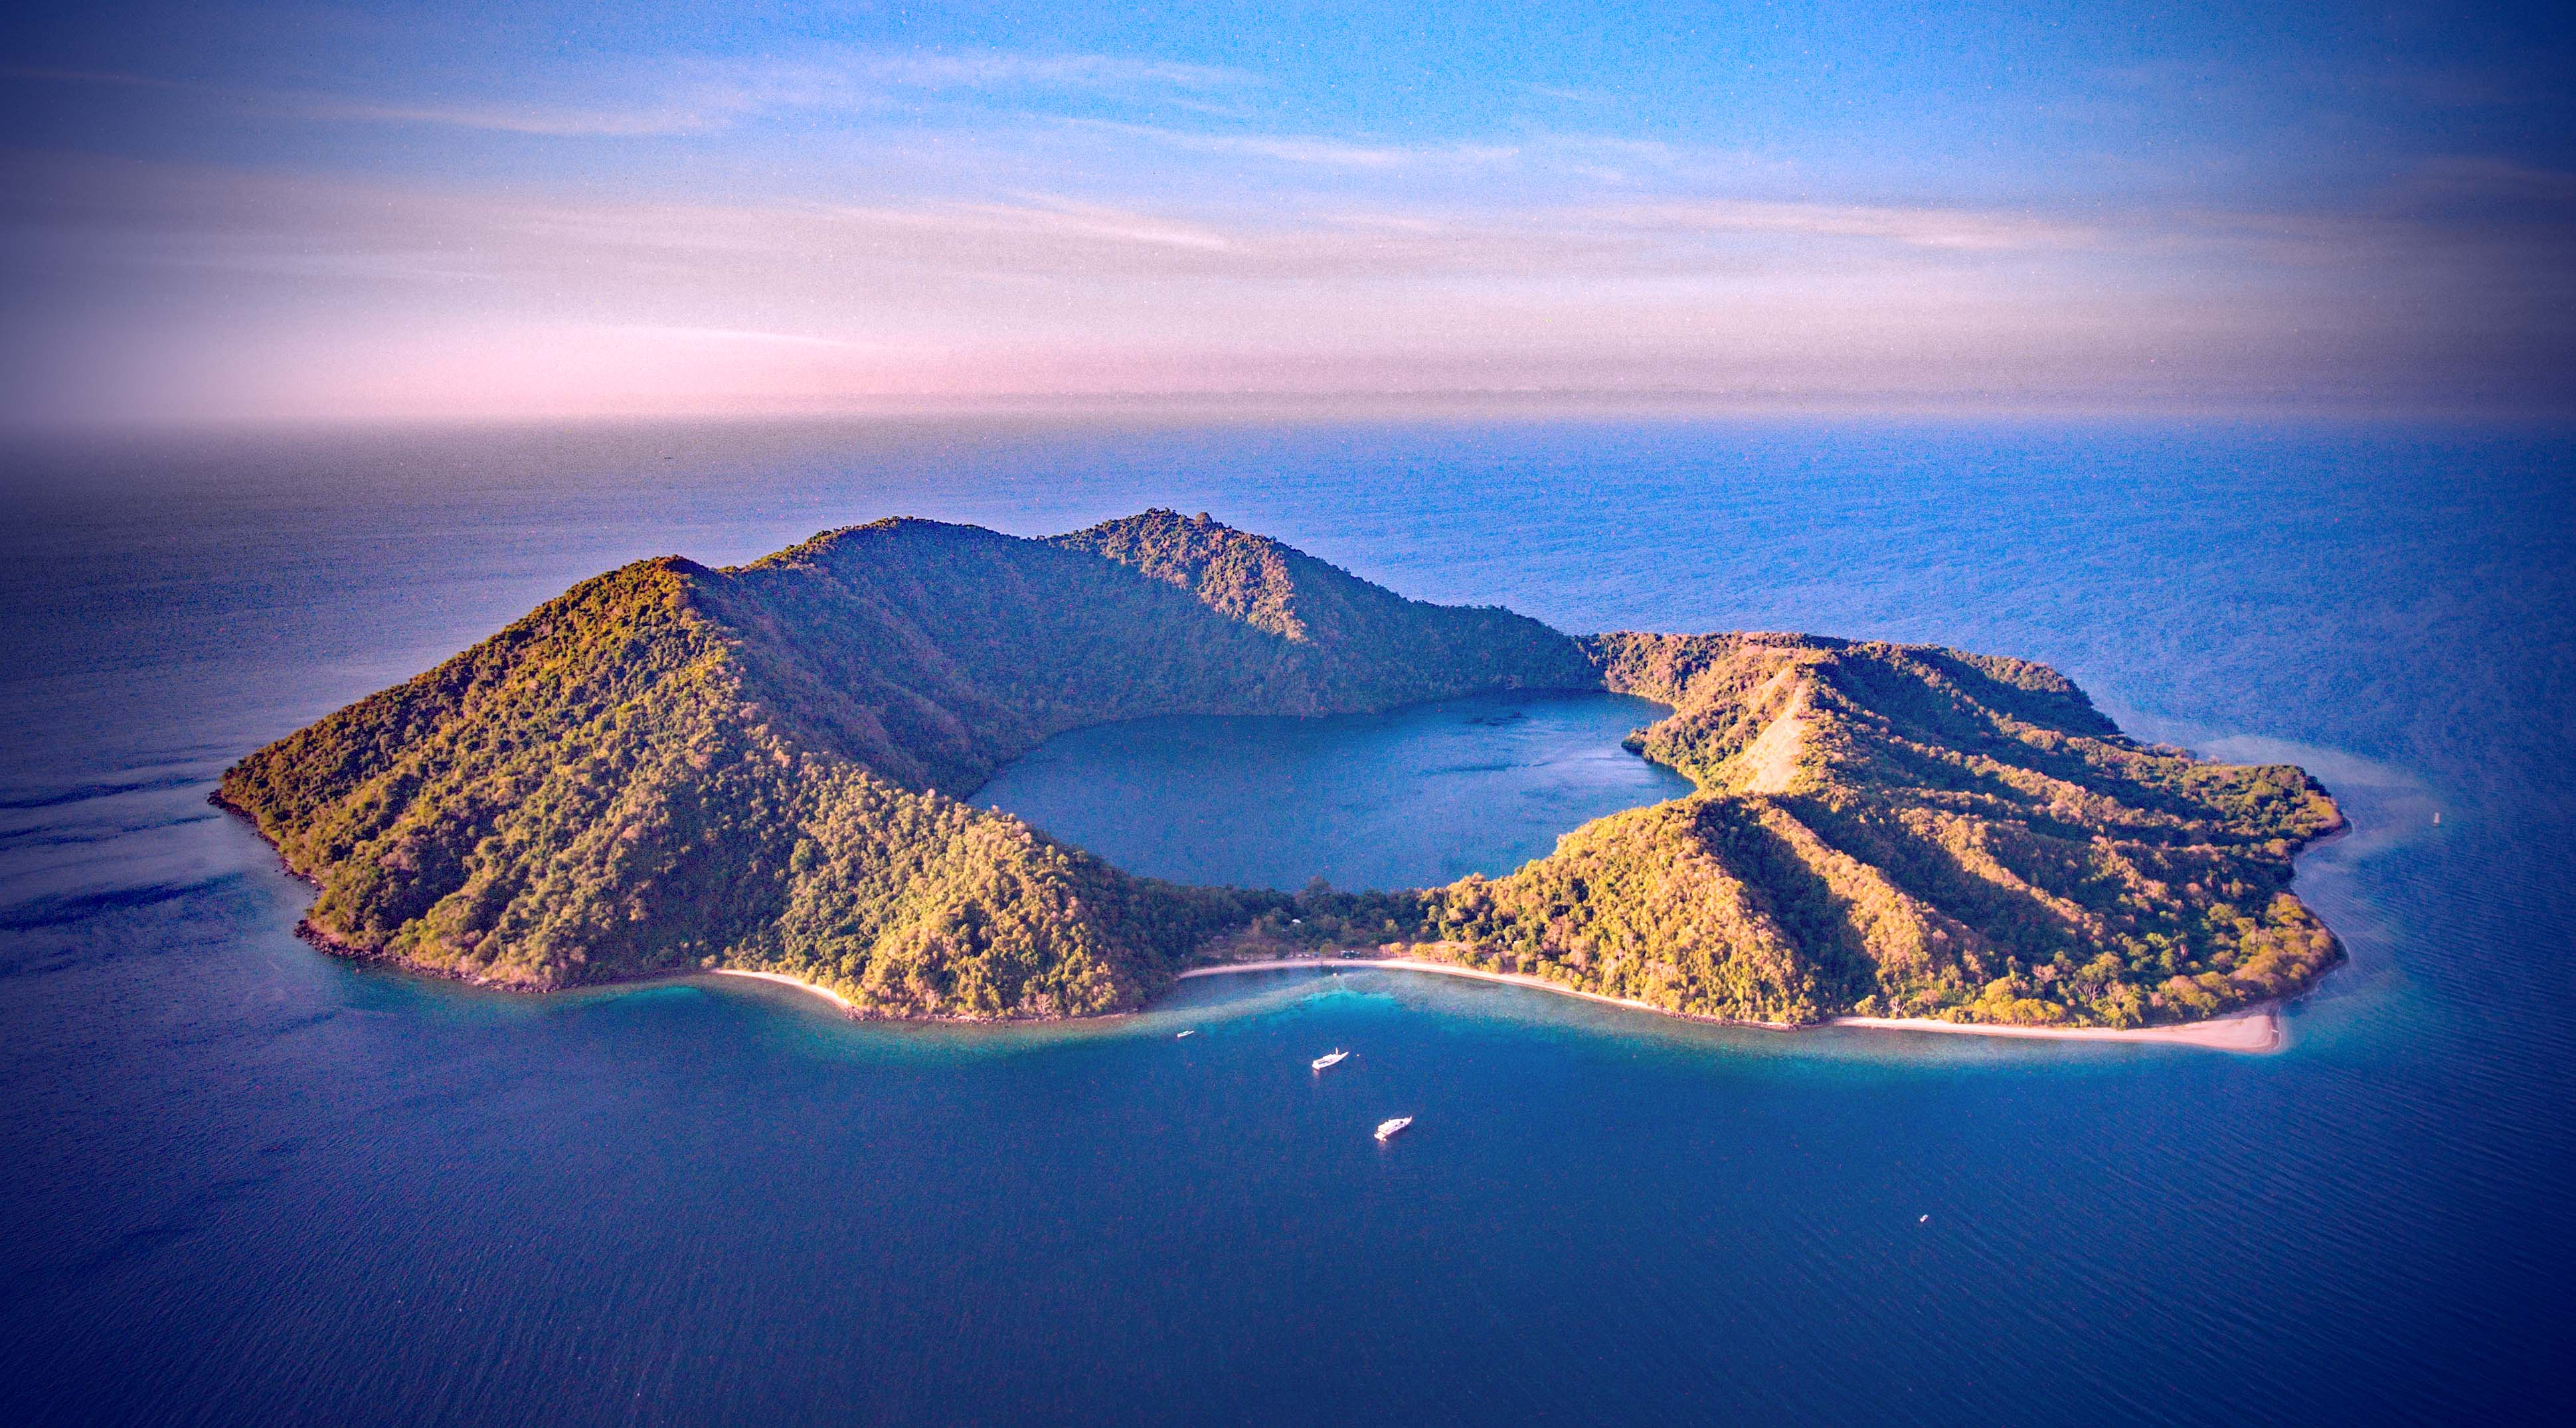 Satonda Island, a extinct volcano that collapsed into the Flores Sea.